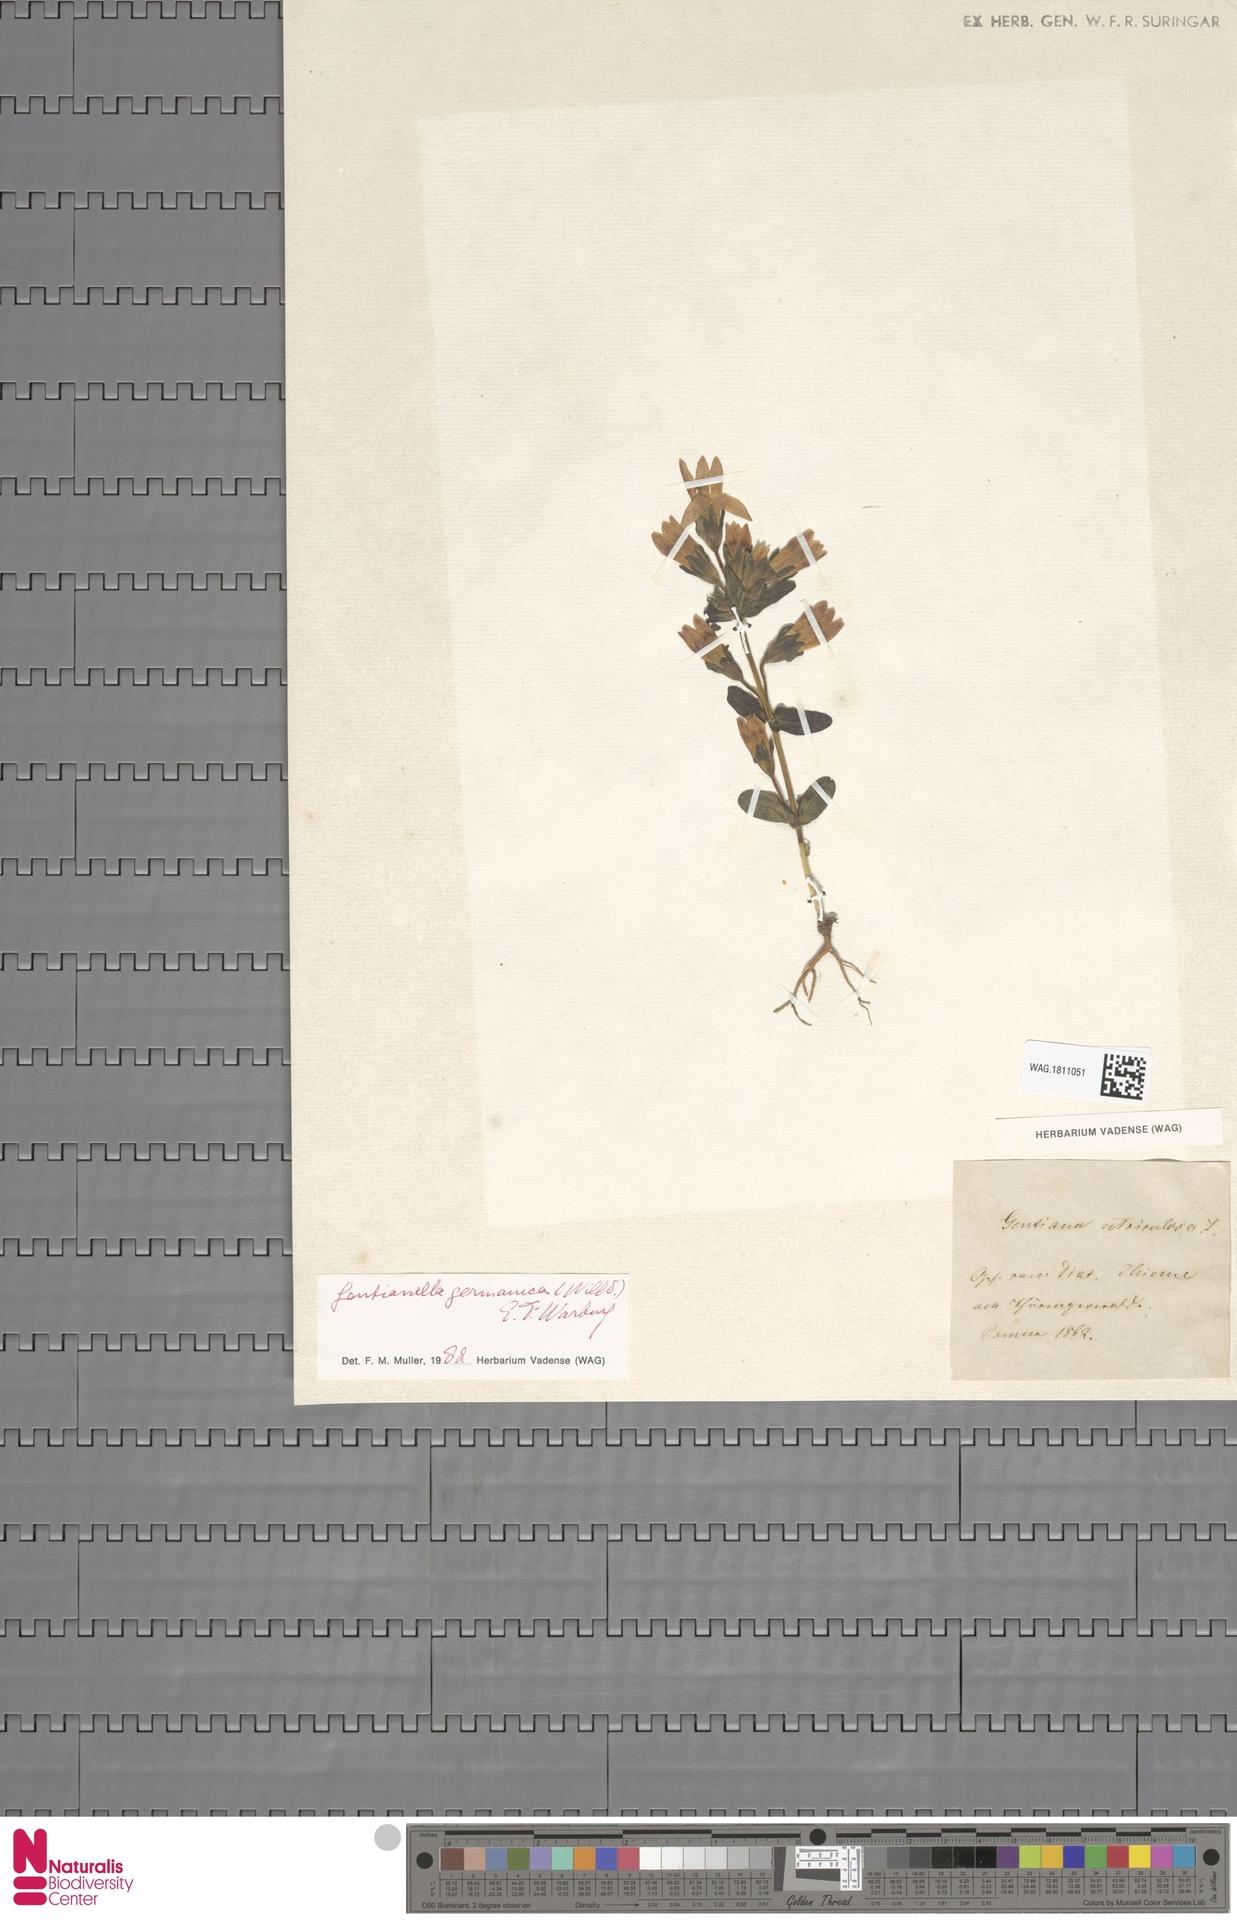 WAG.1811051   Gentianella germanica (Willd.) E.F.Warb.